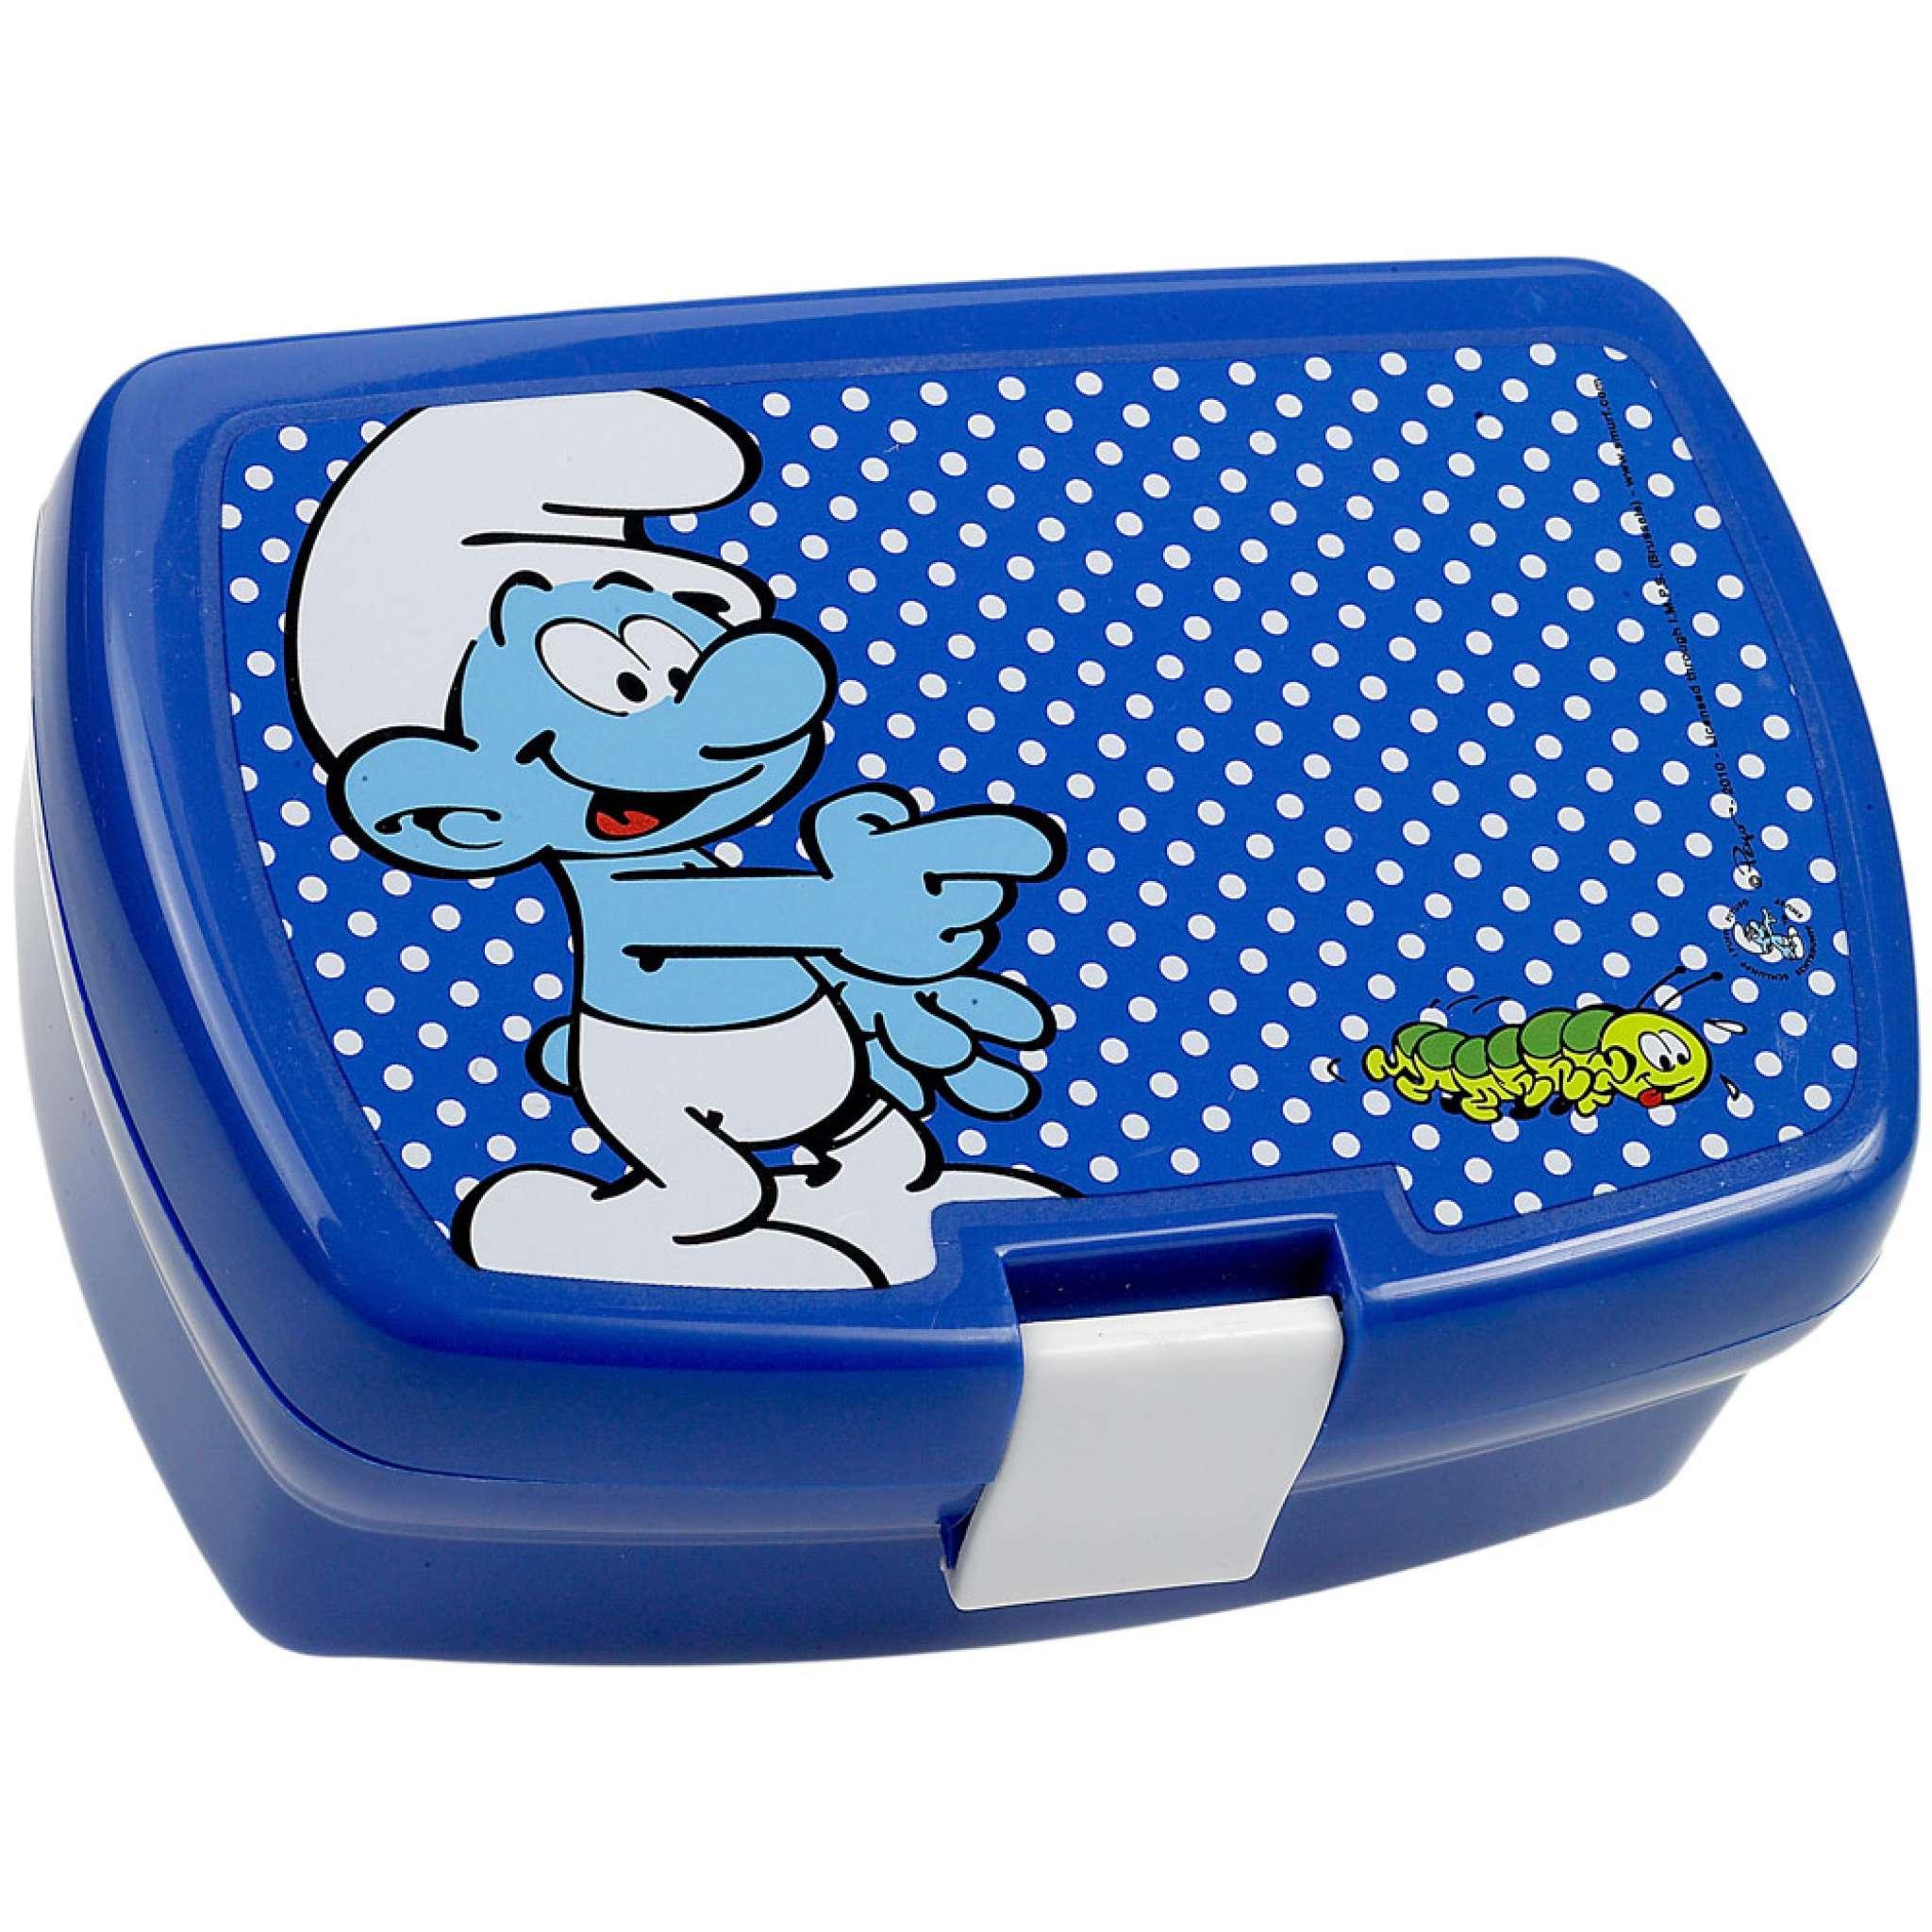 Lunchbox Smurf Blå